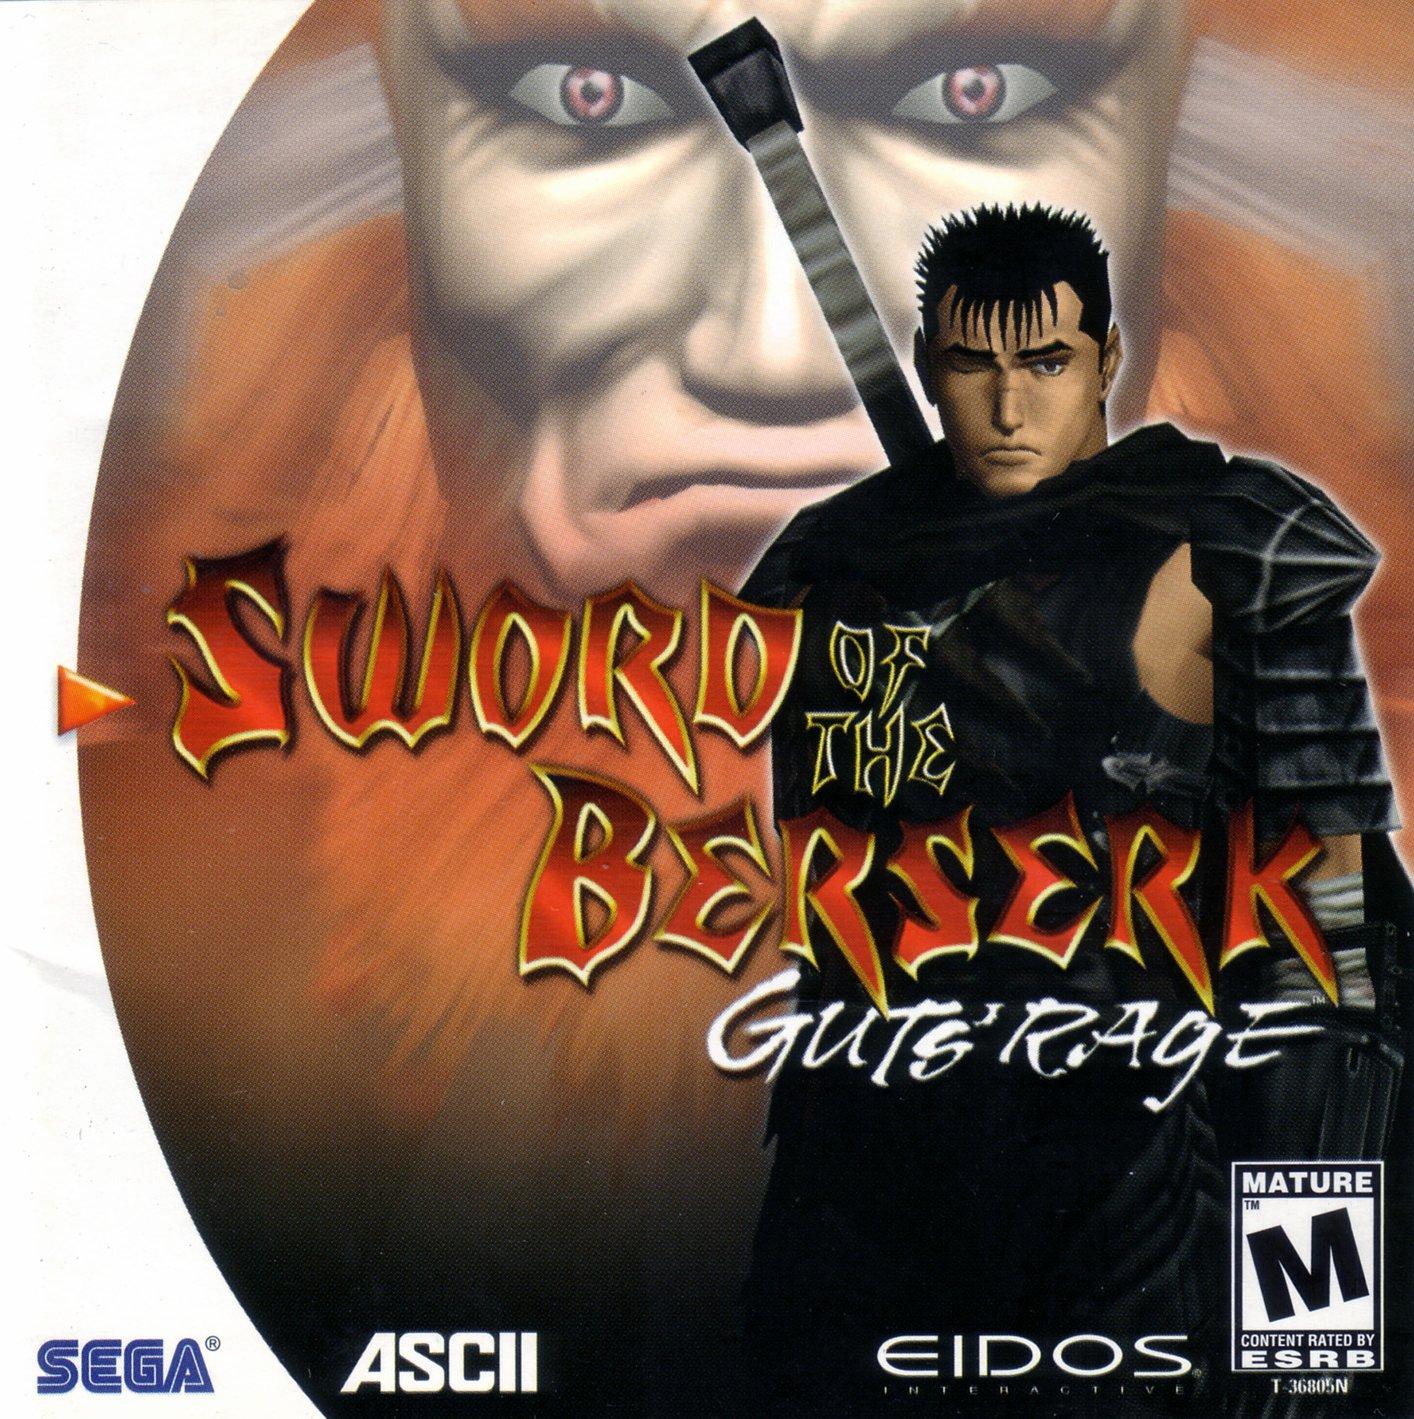 Sword of the Berserk Guts' Rage cover